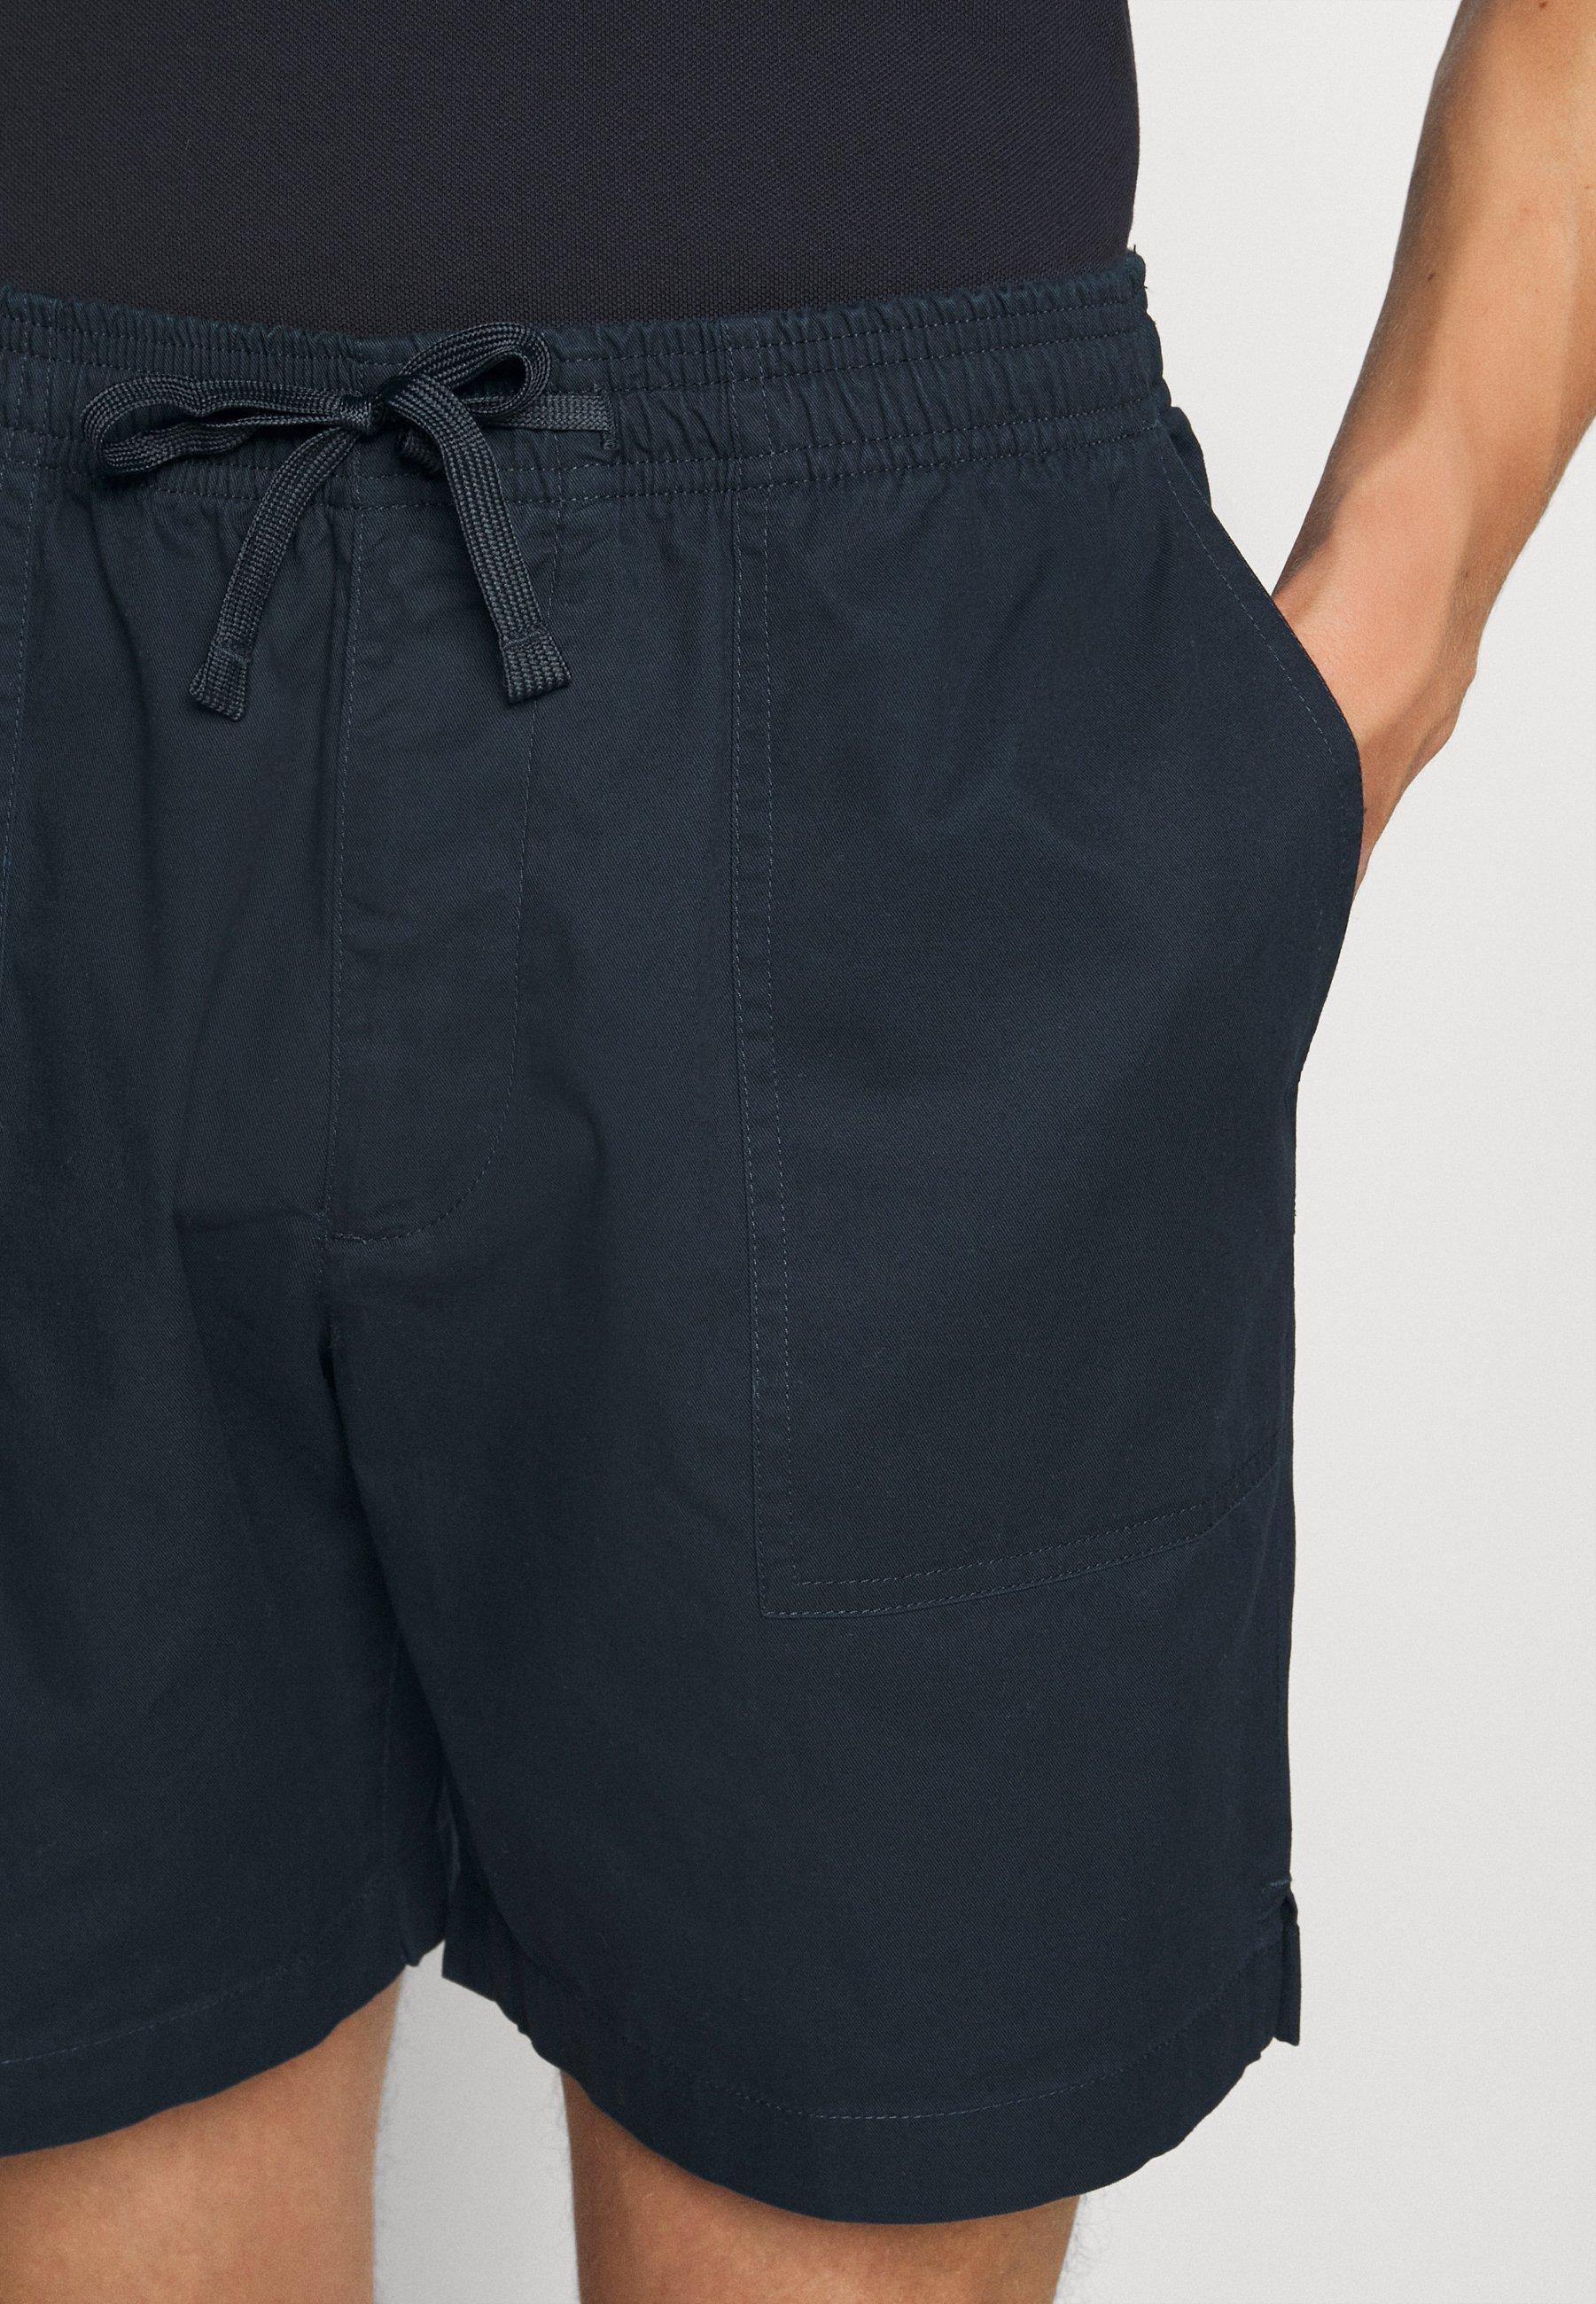 Club Monaco Utility - Shorts Navy